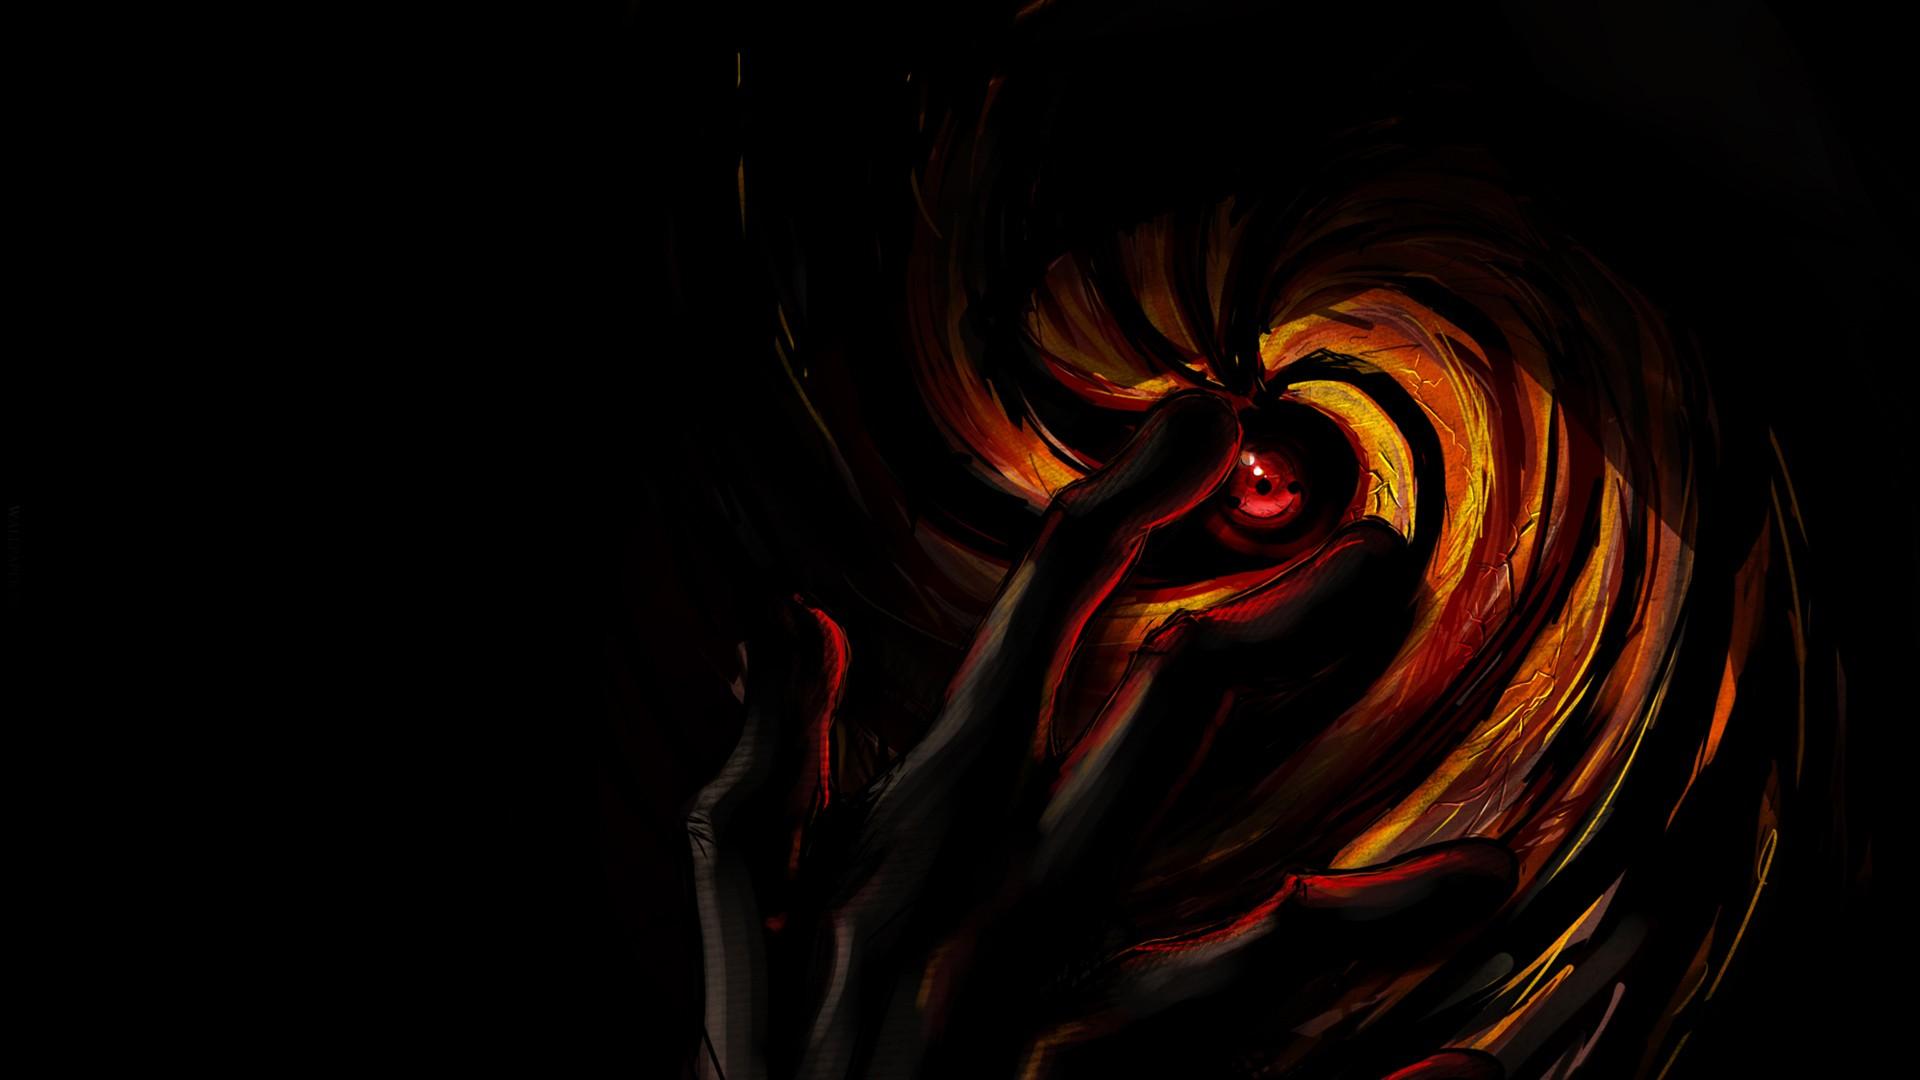 Fondo de Pantalla Naruto Zorro HD   Wallpapers HQ 1080p 1920x1080